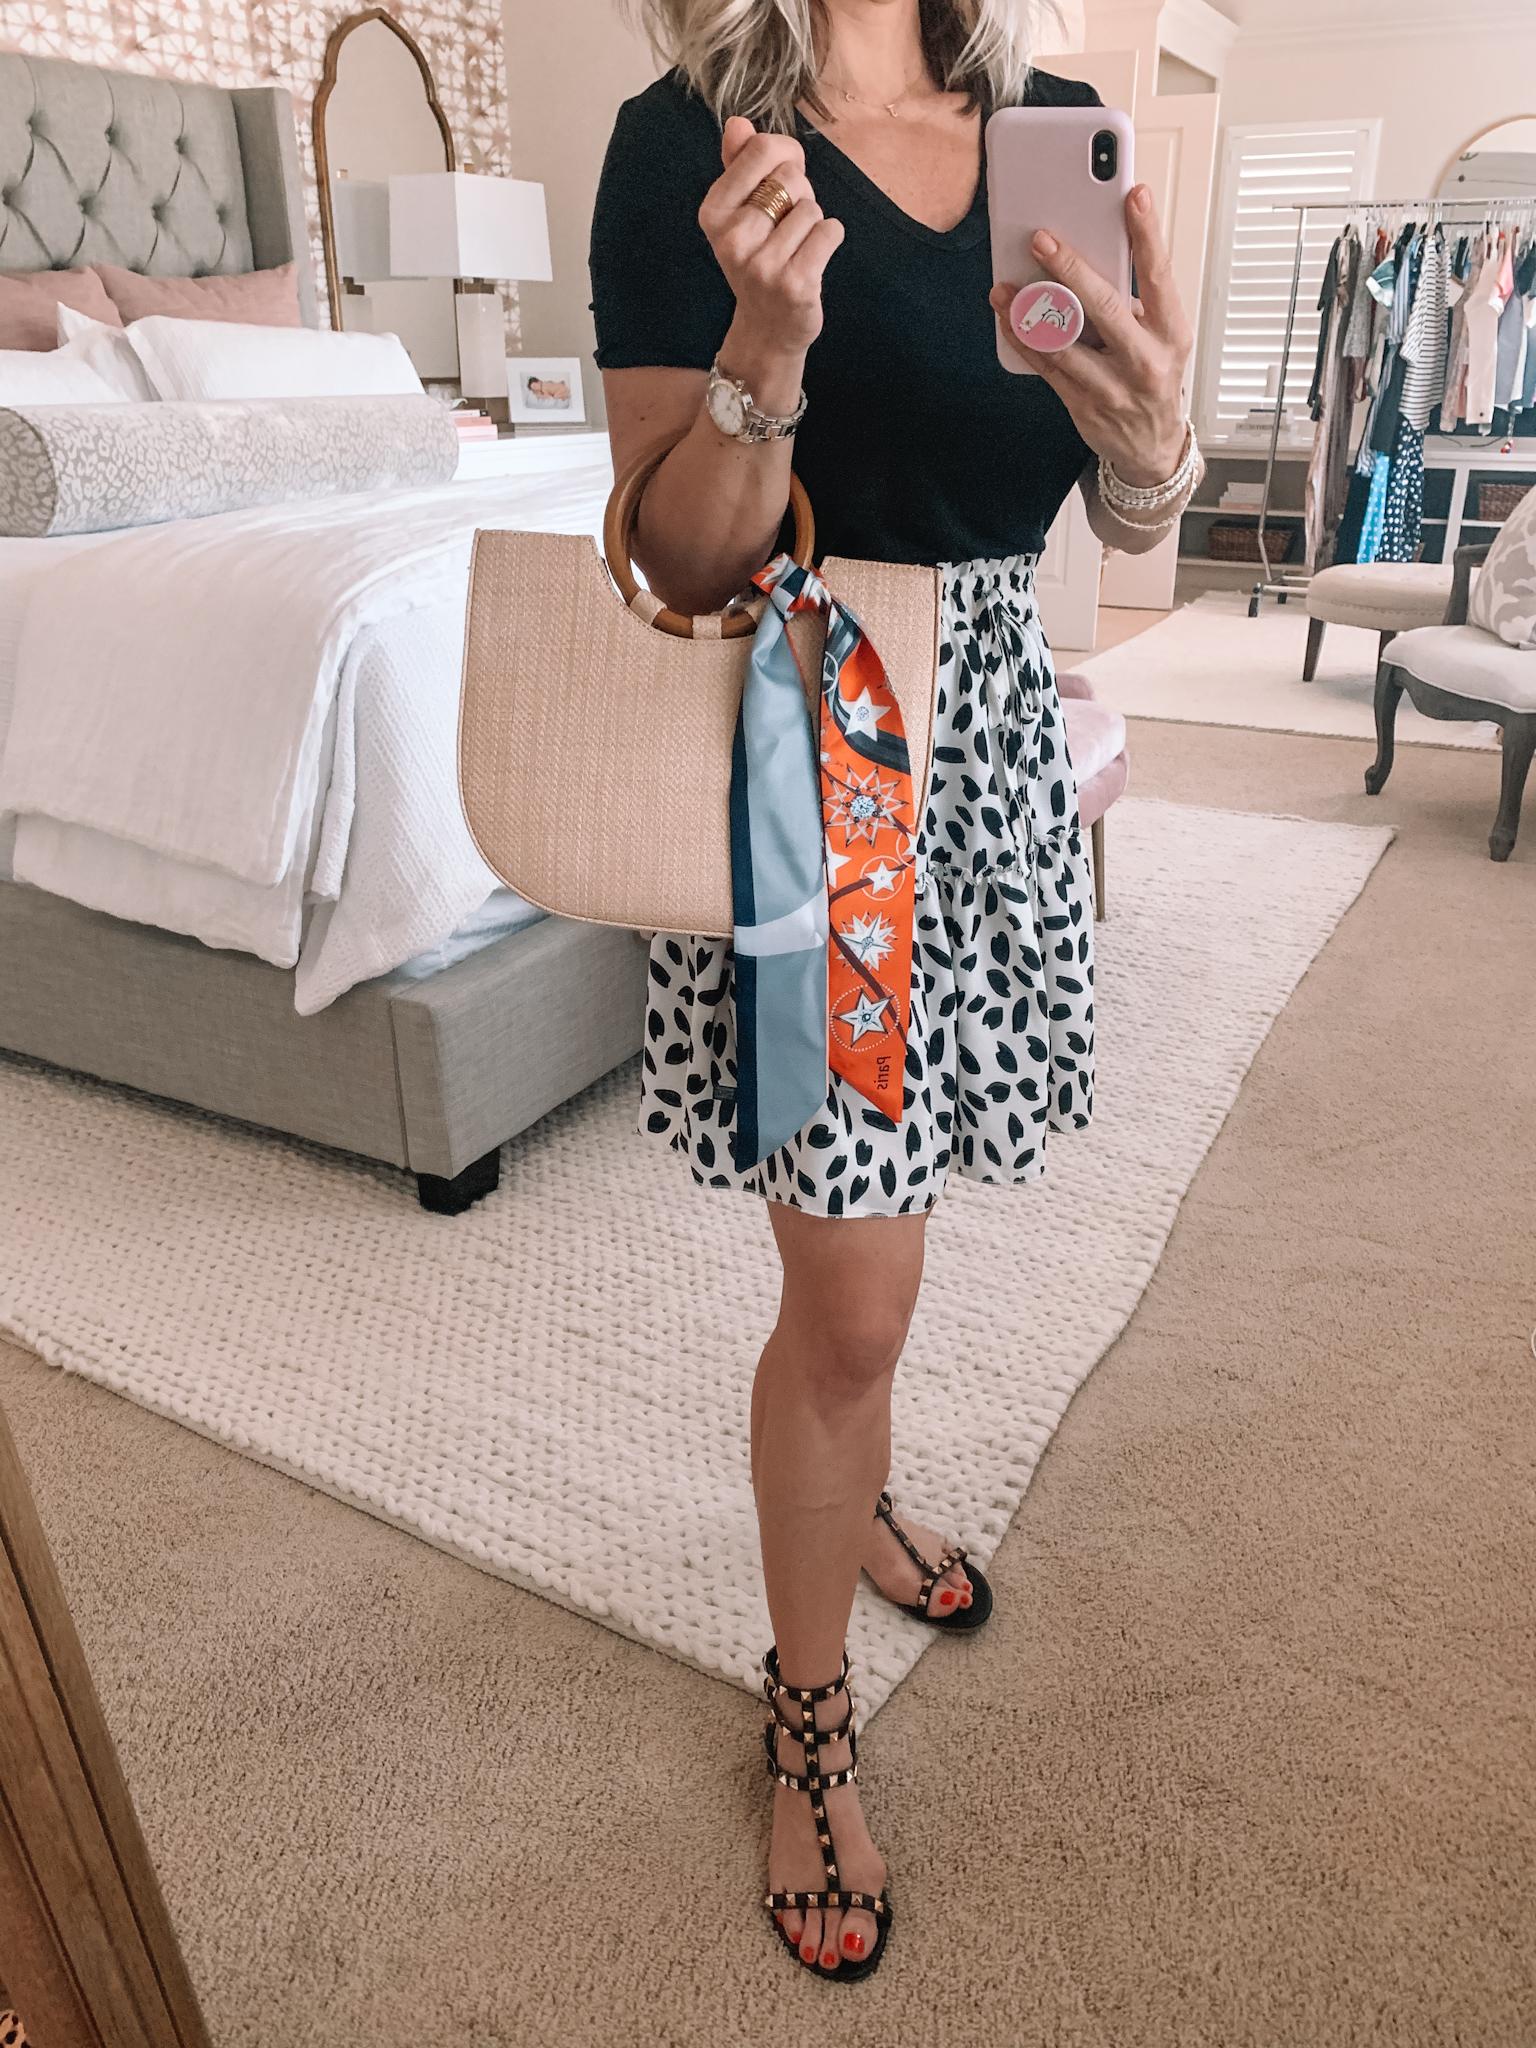 Amazon Fashion - Black V-Neck Tee, Leopard Dot Skirt, Studded Sandals